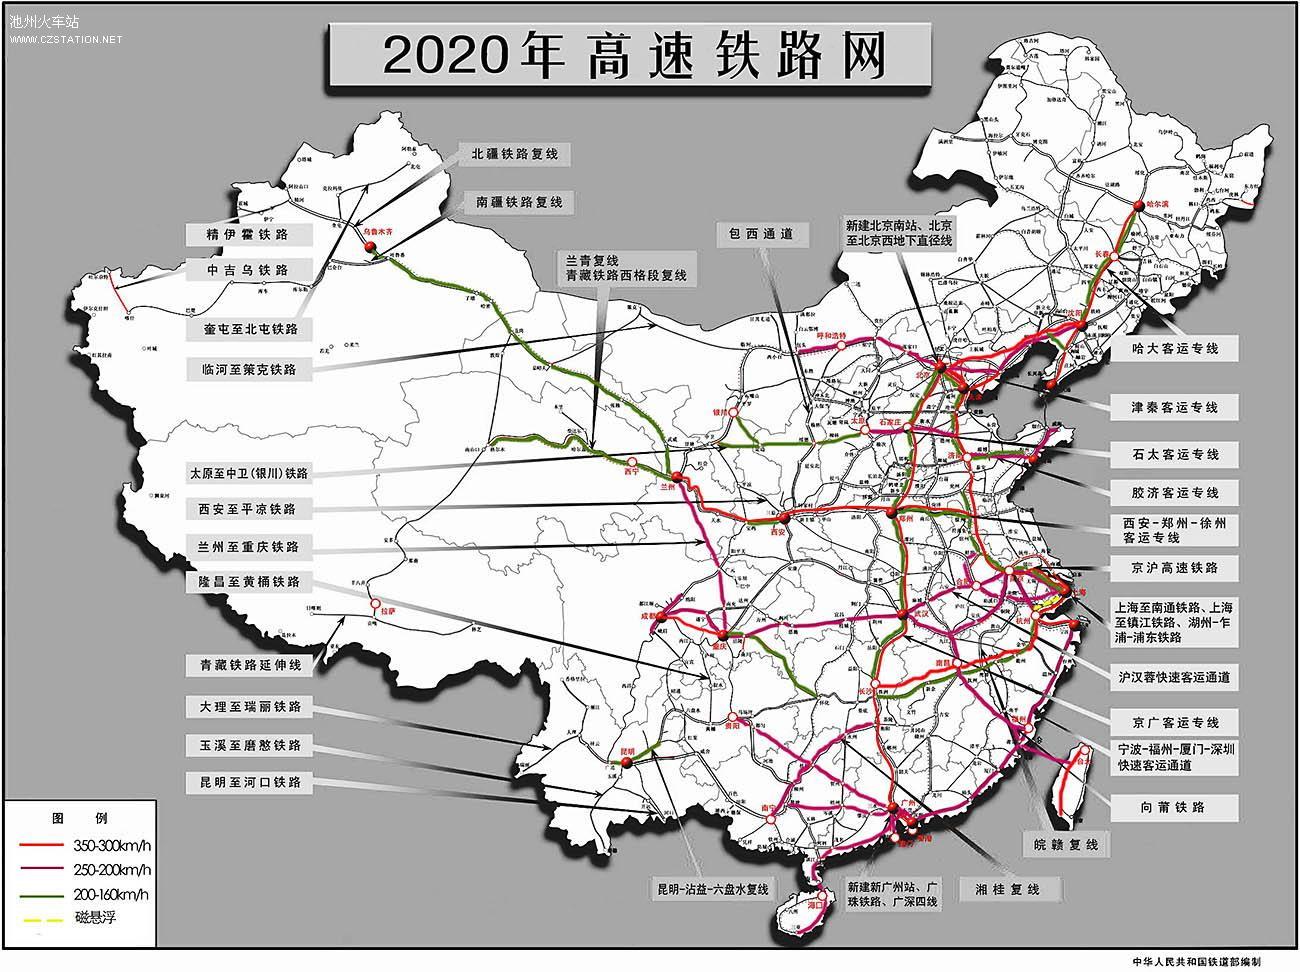 HSR 2017 Predictions China - Collective Responsibility